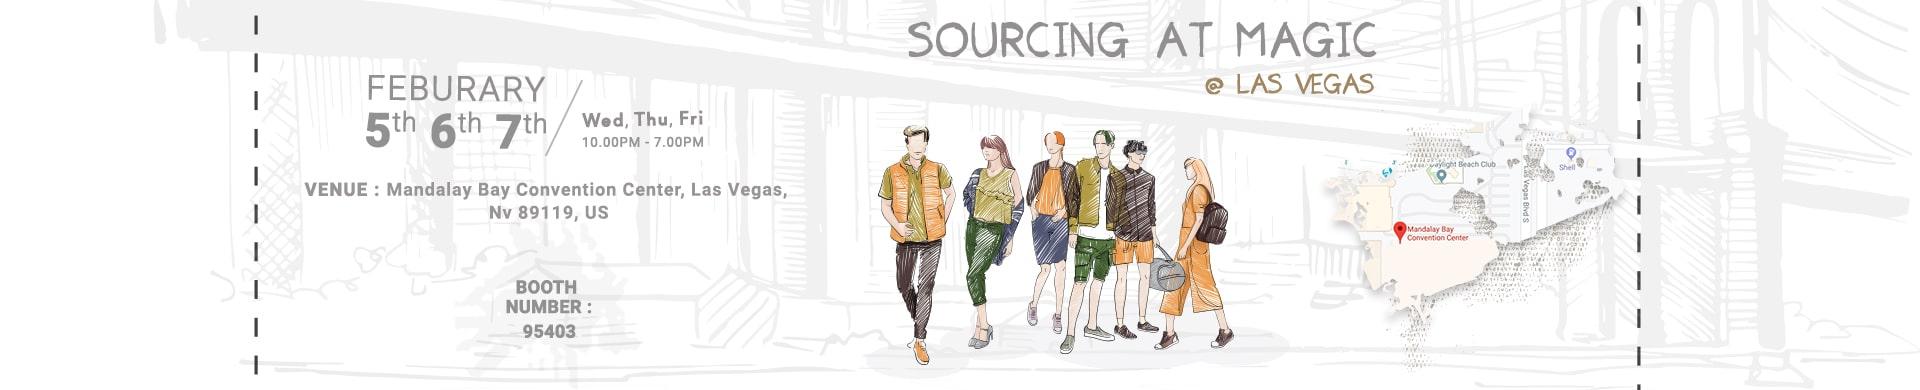 sourcing-at-magic